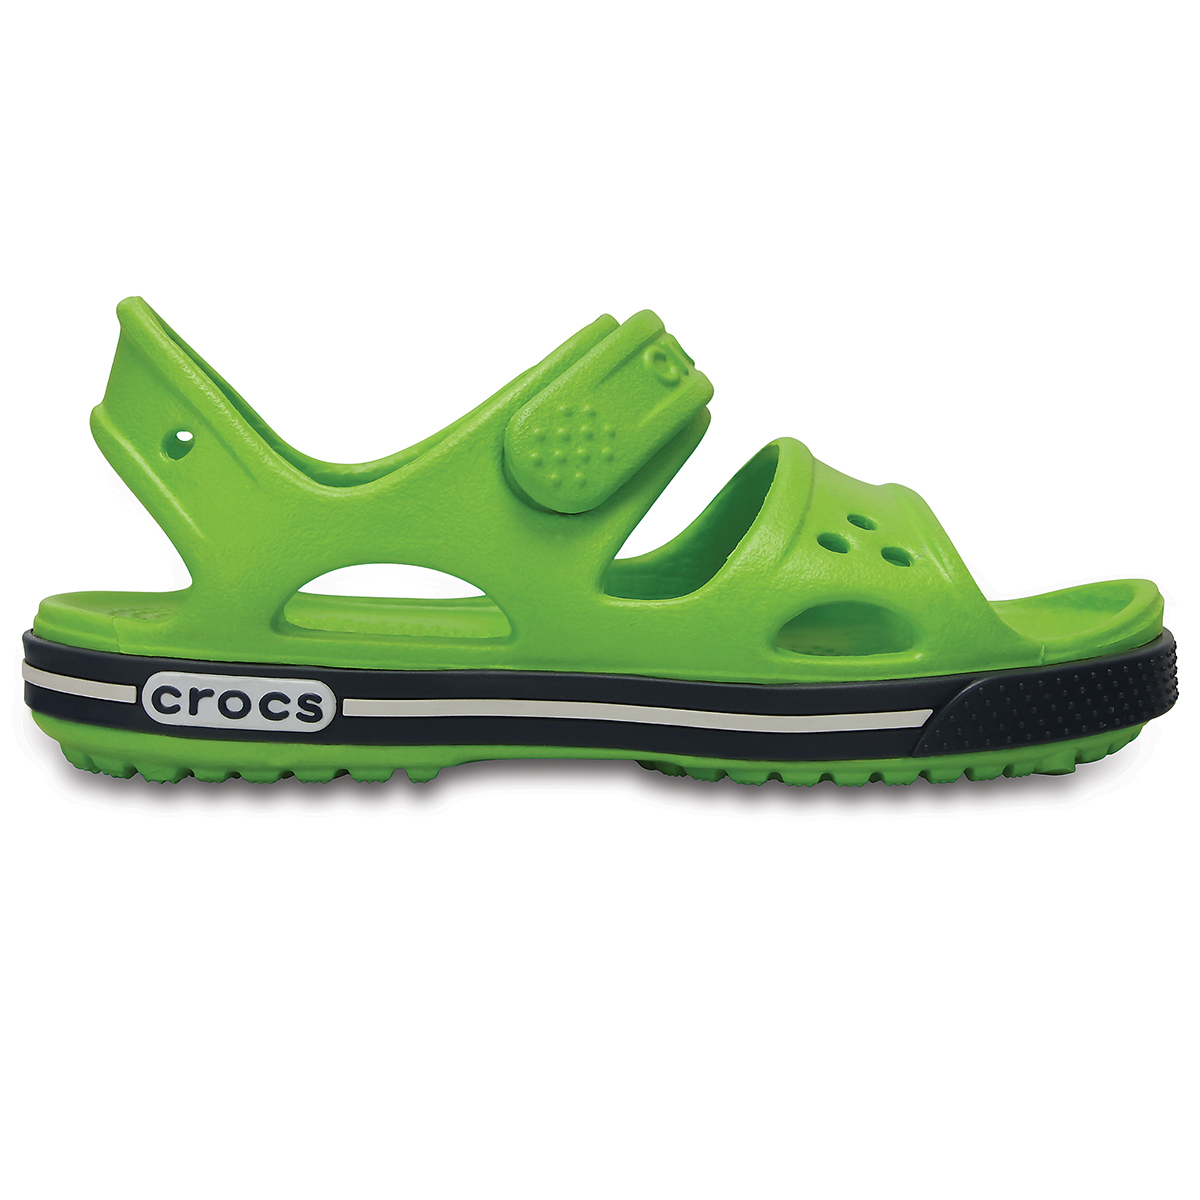 Crocs Crocband II Sandal PS - Volt Yeşil/Lacivert